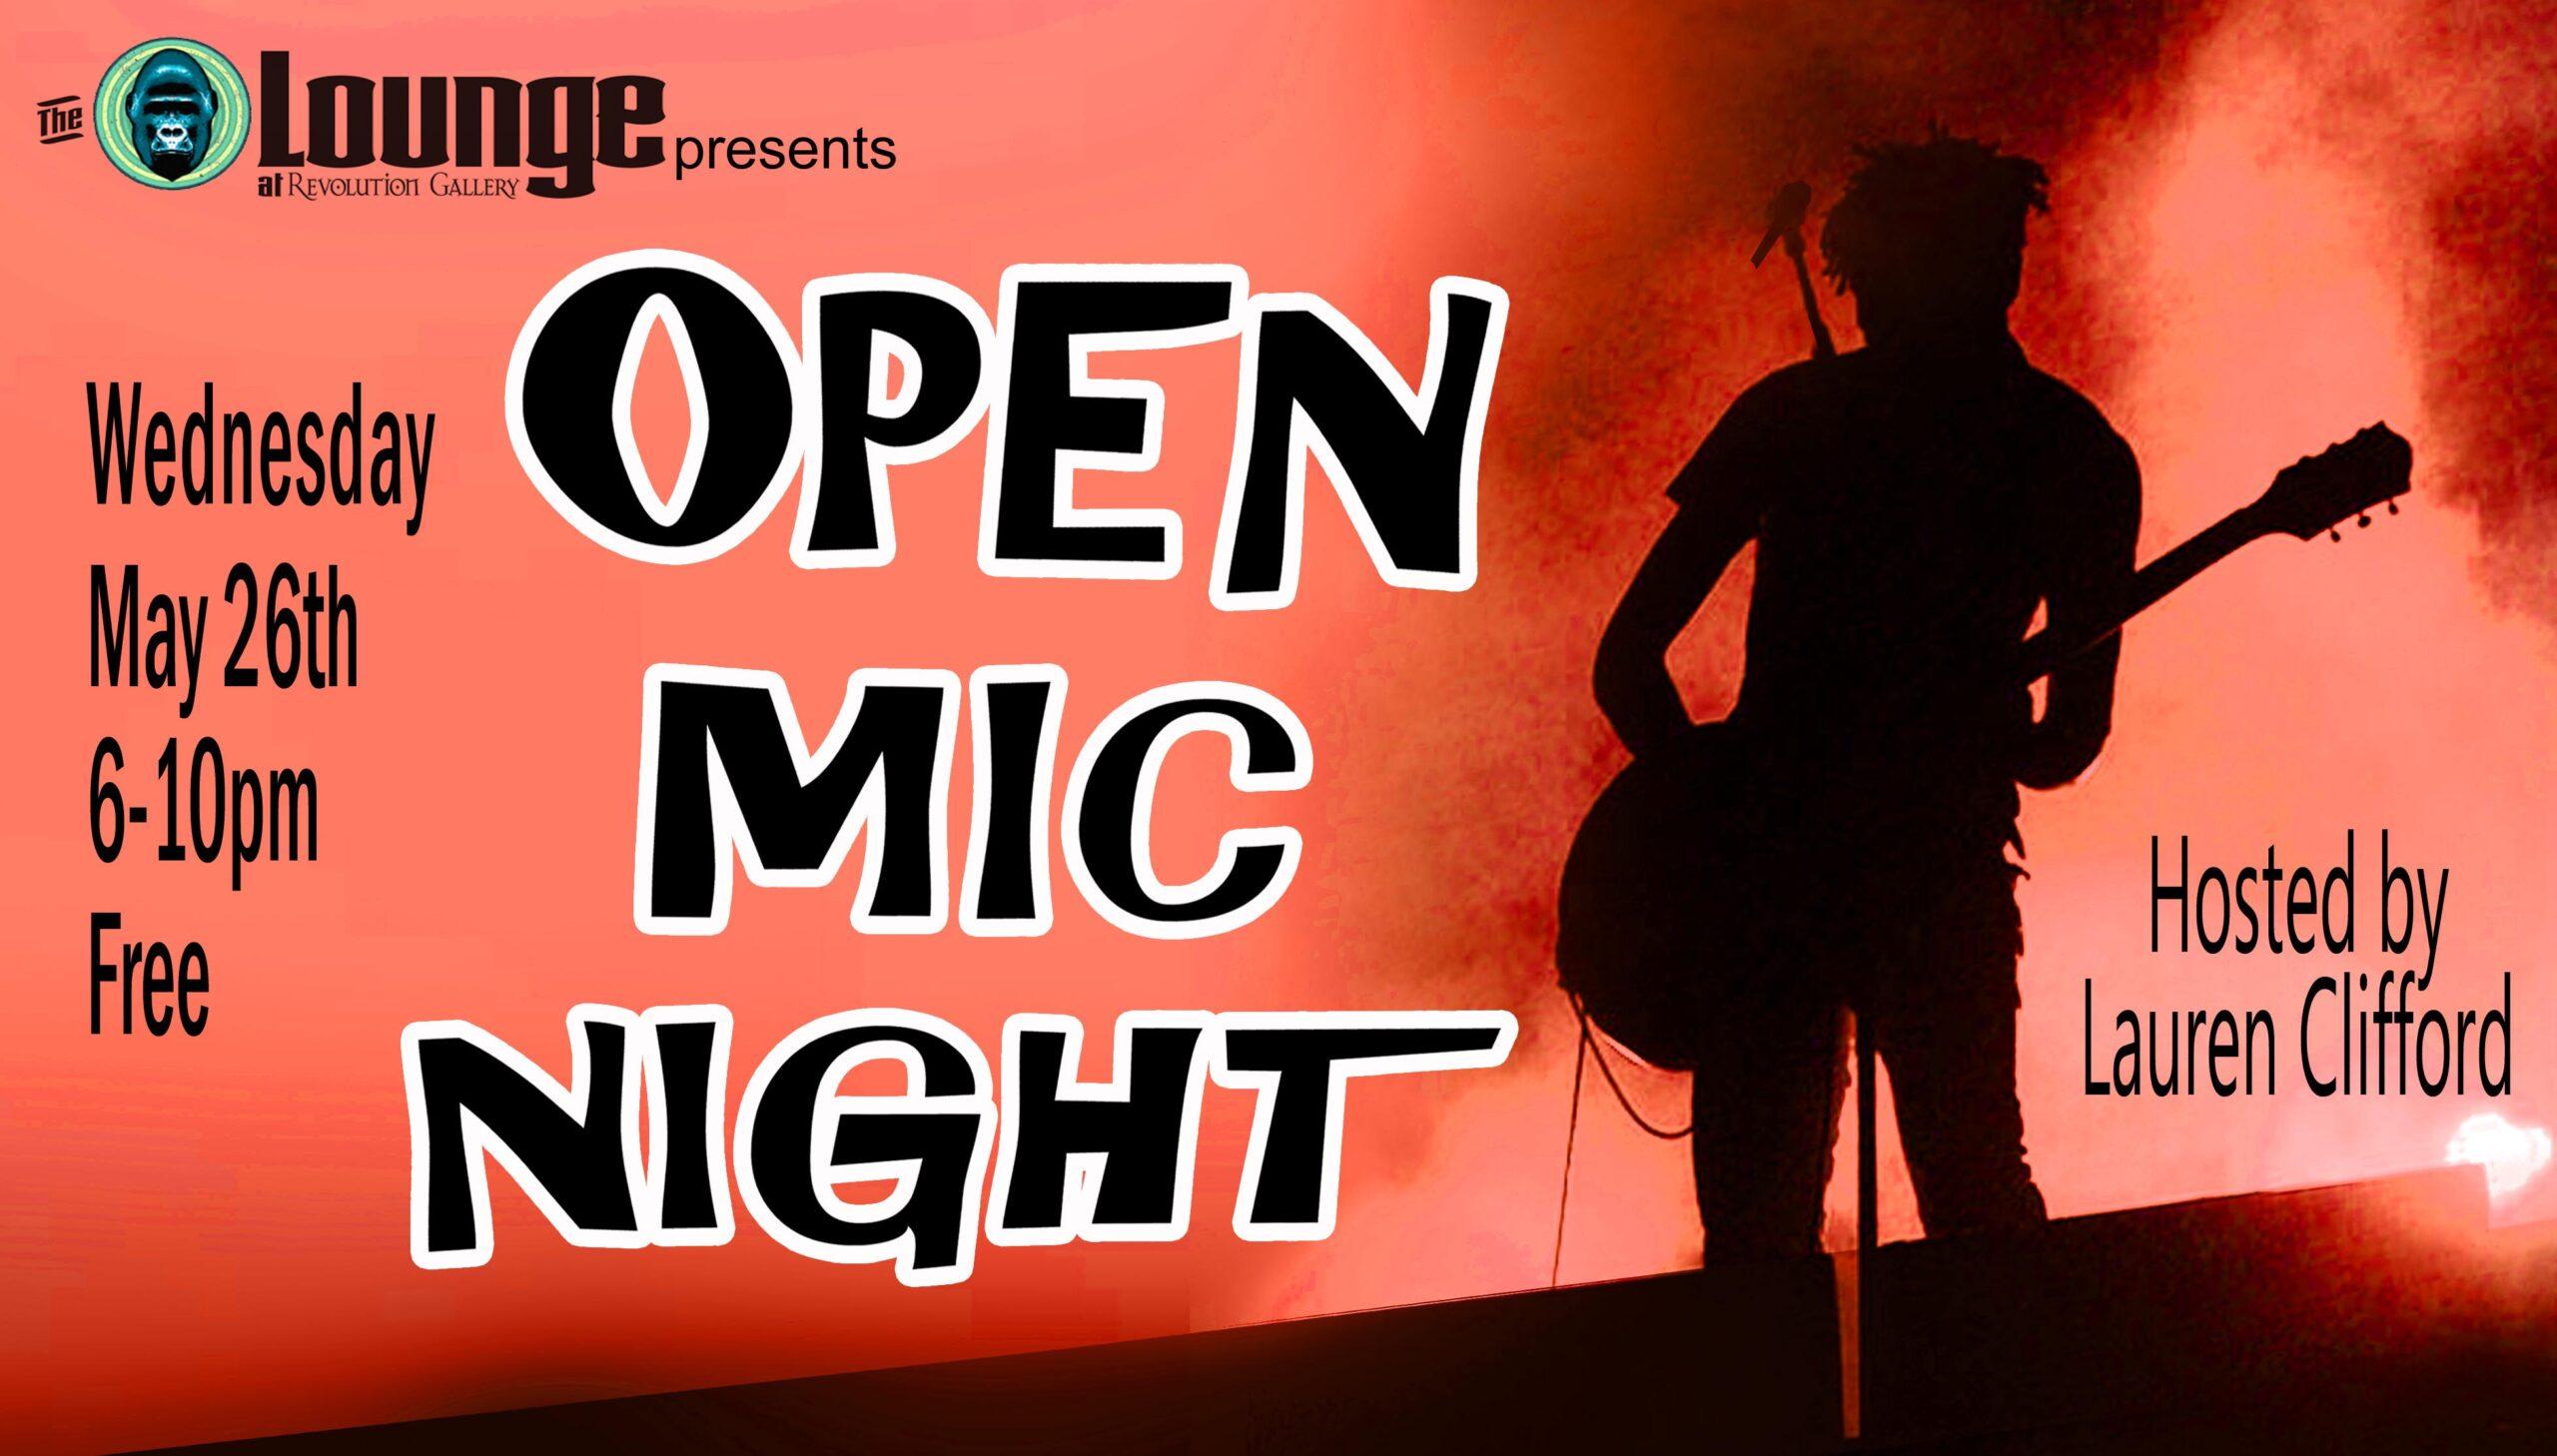 open_mic_promo_banner_2021-5-26-21